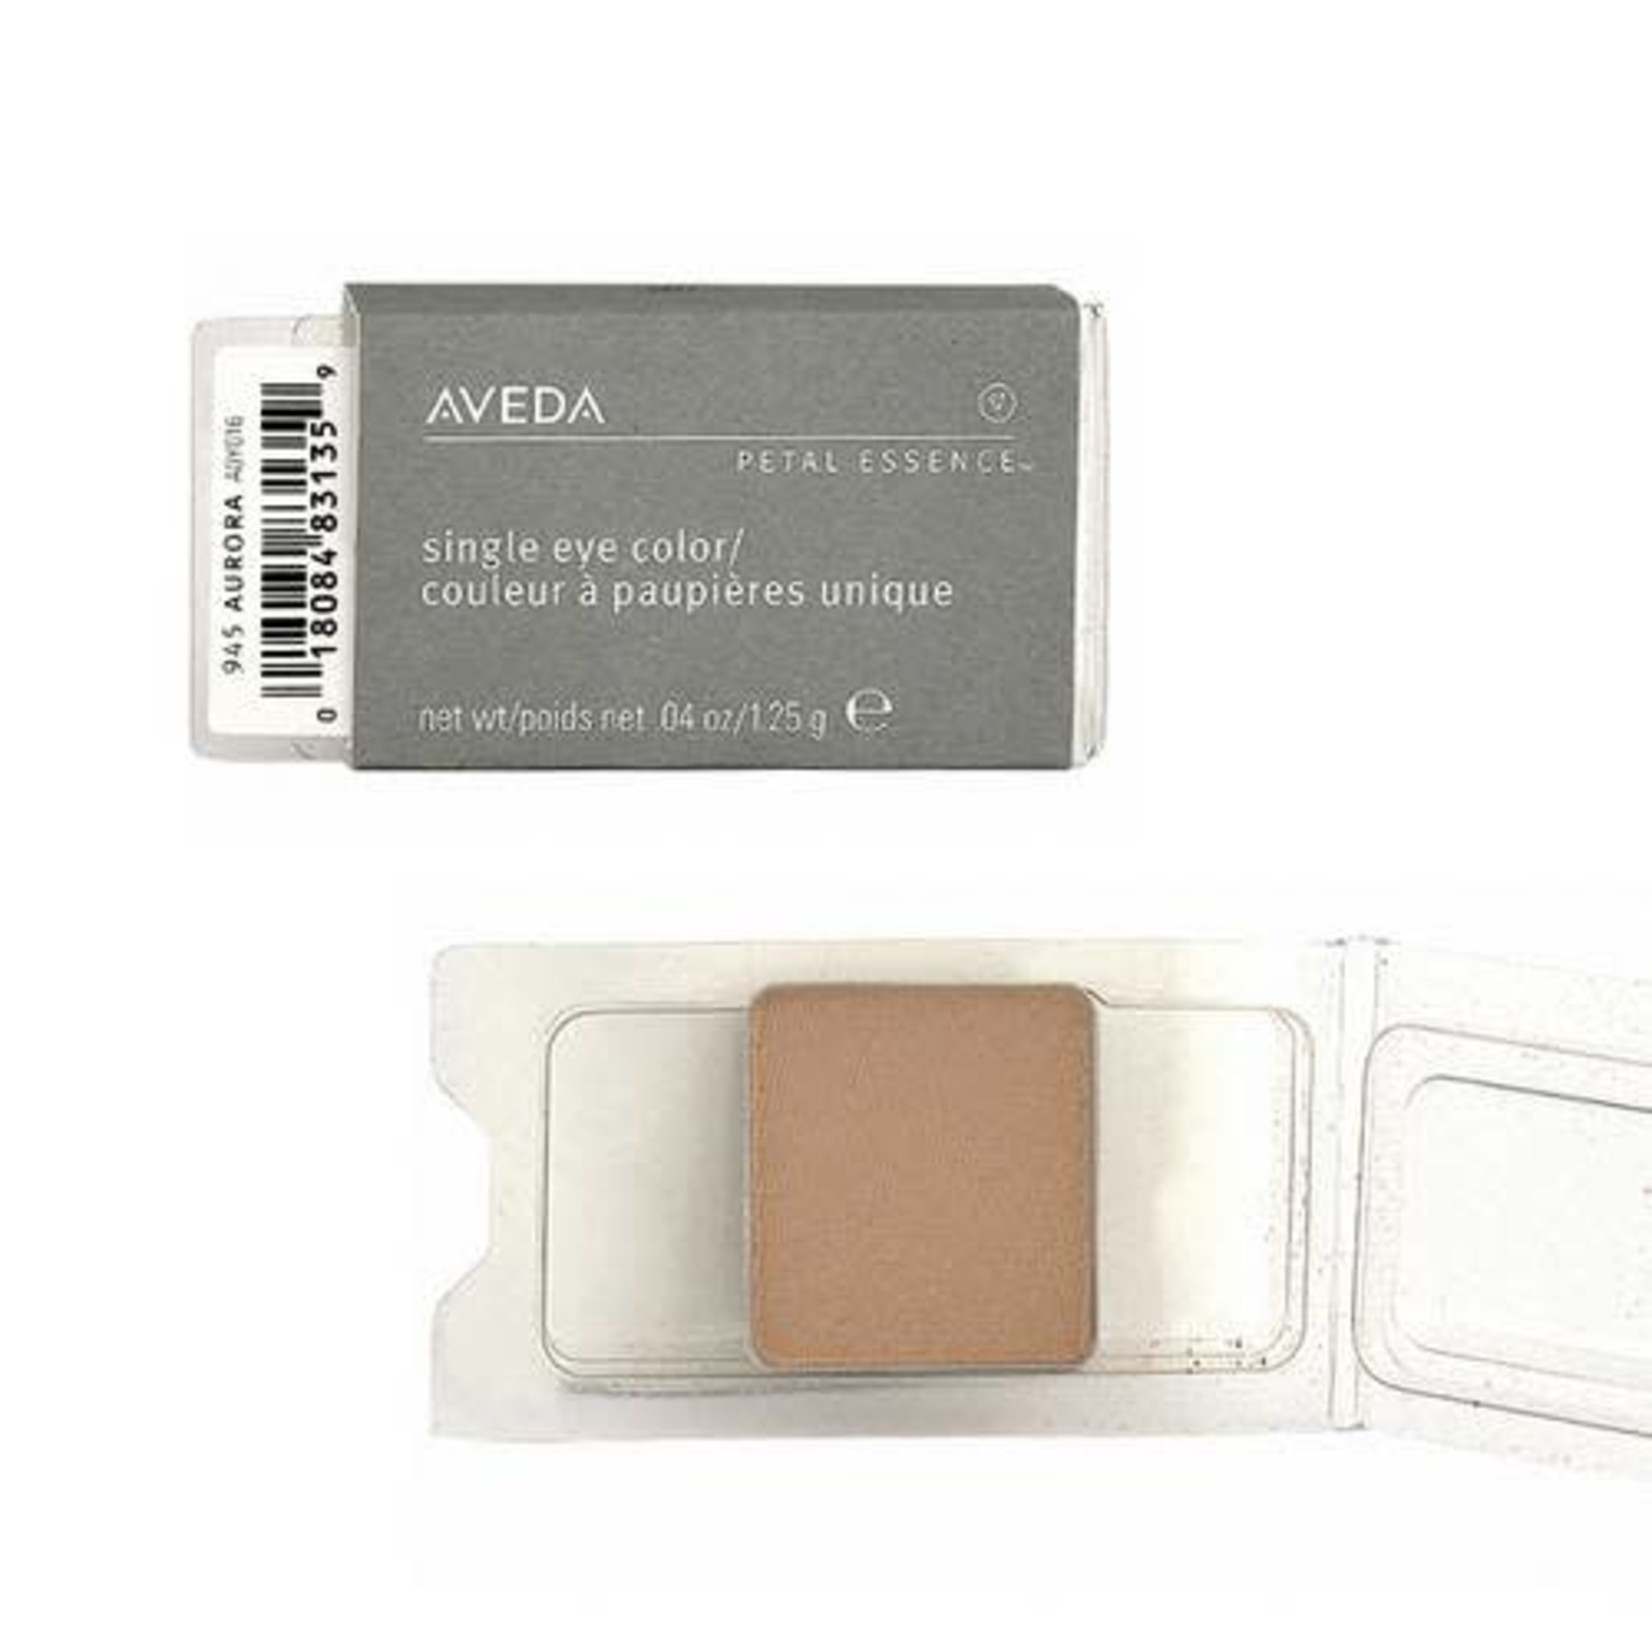 AVEDA Petal Essence™ Single Eye Color